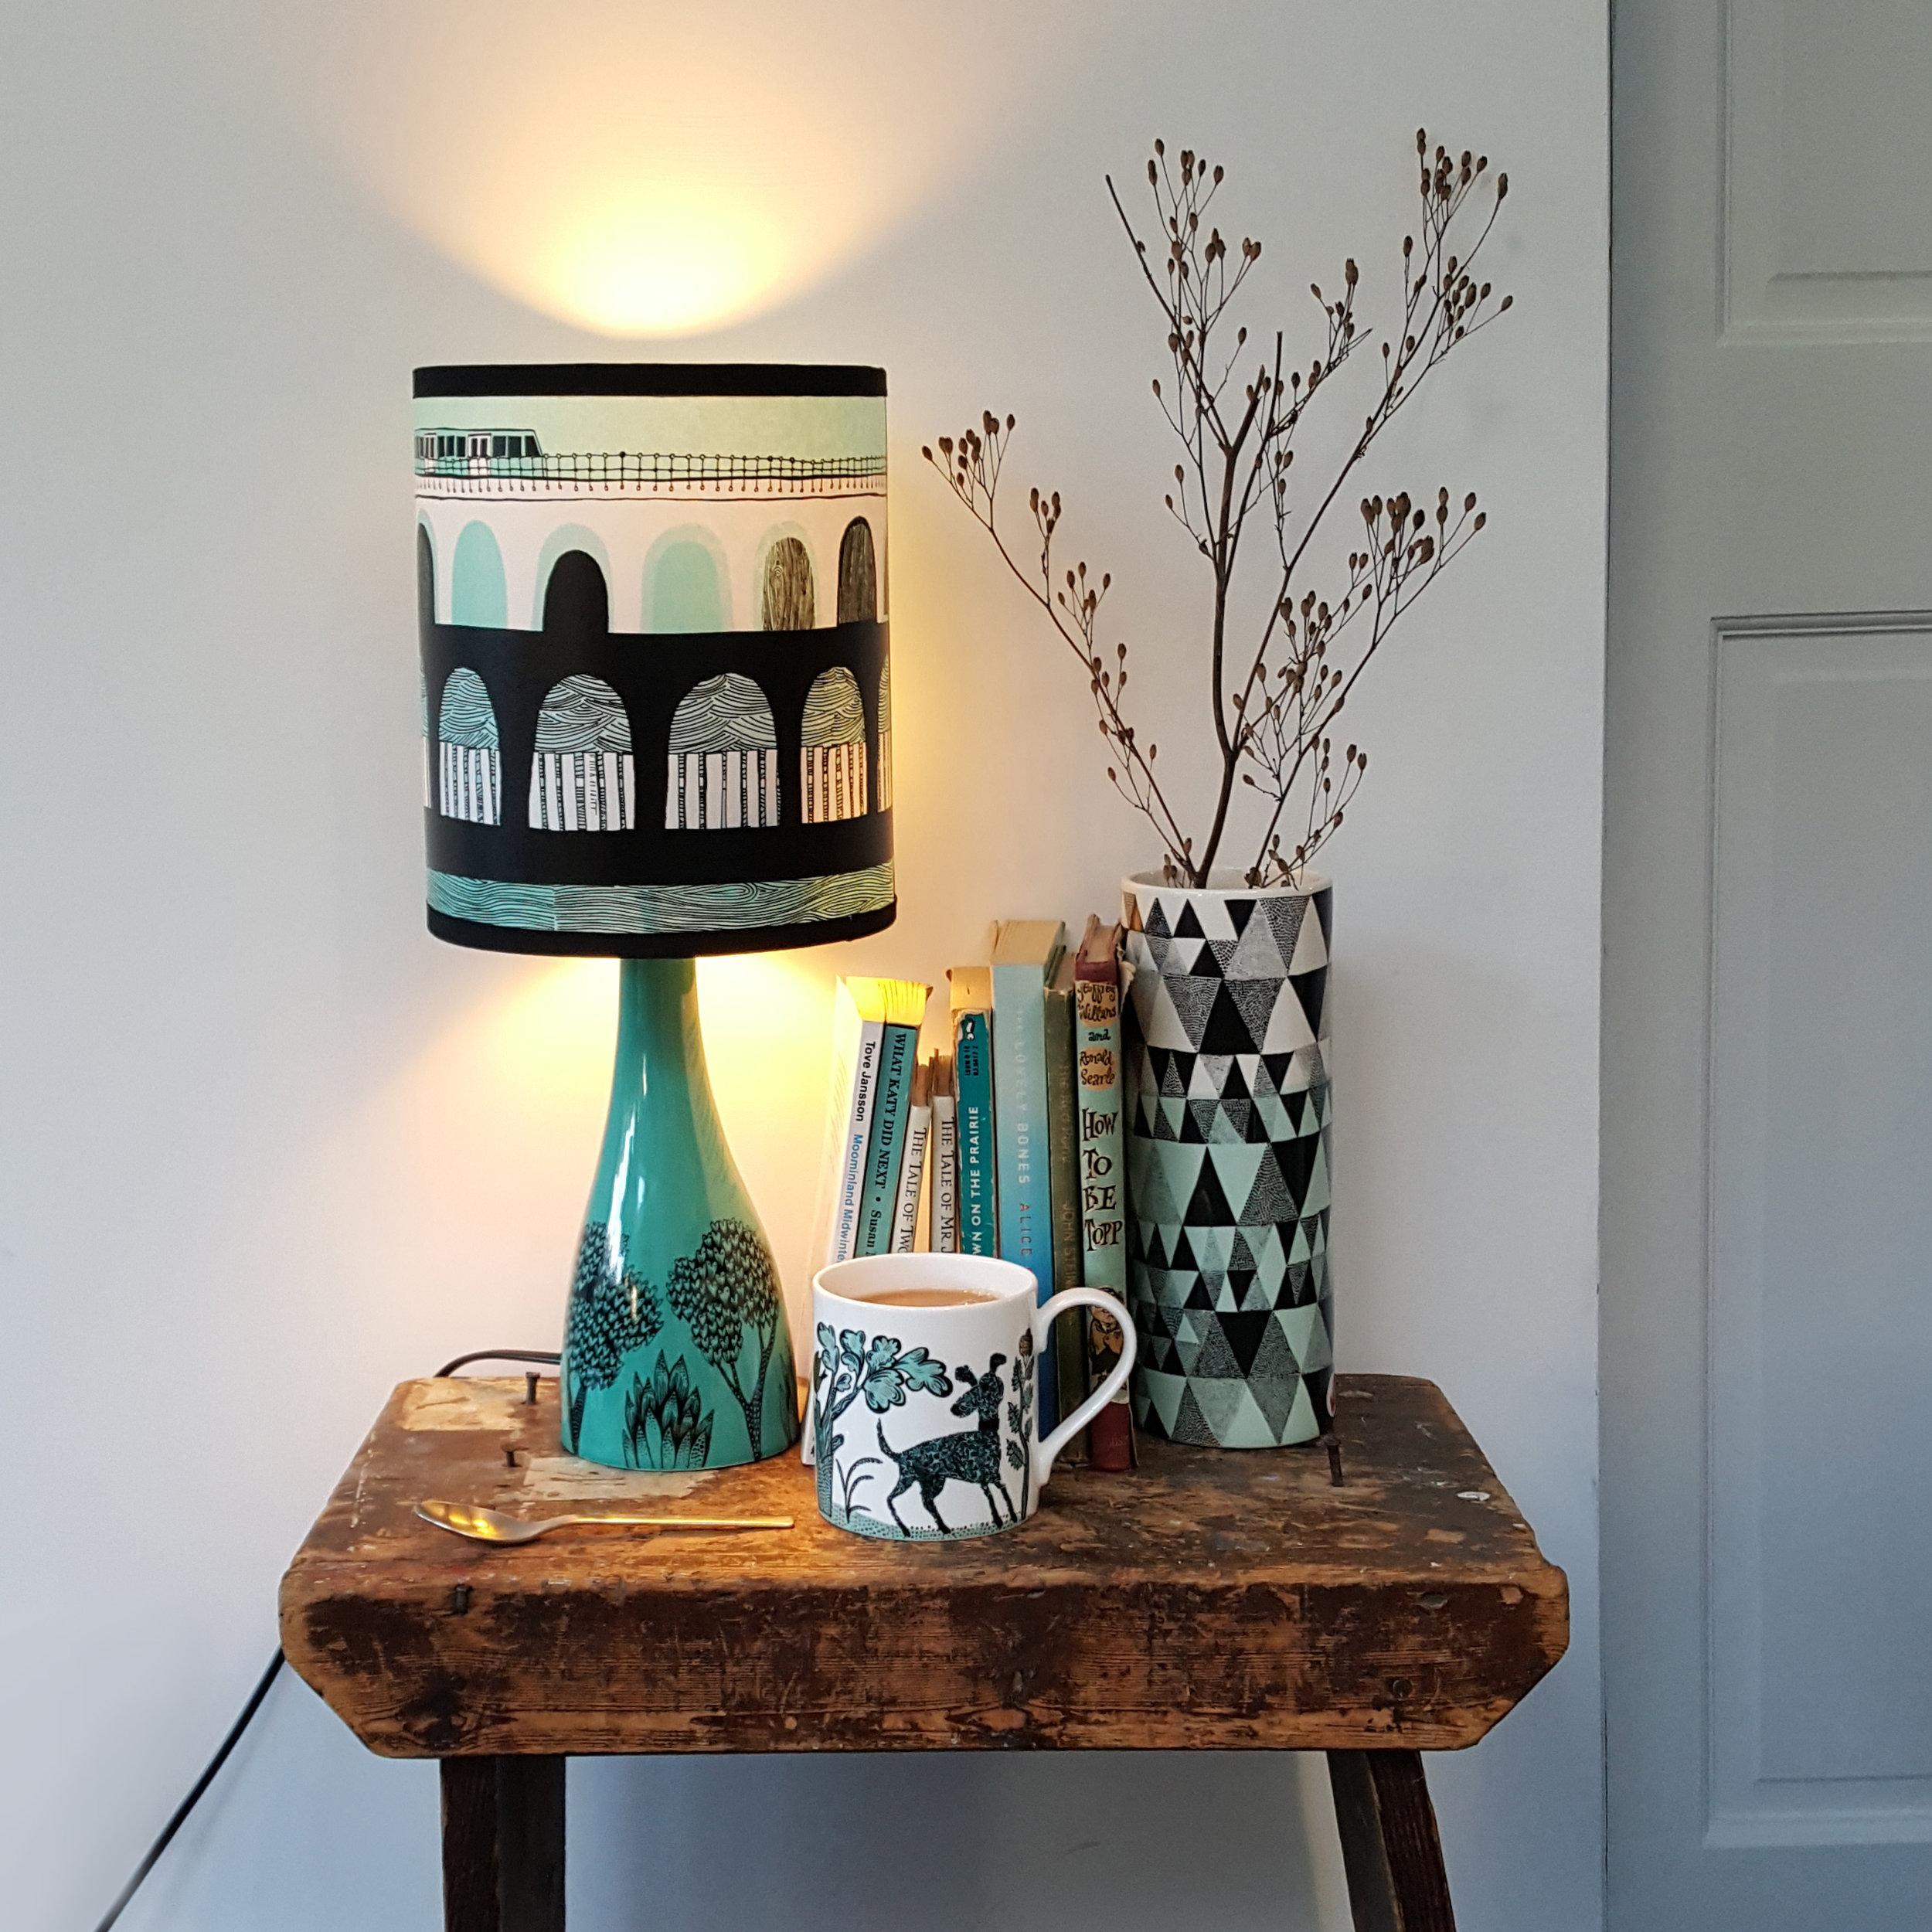 Deptford - Lush Designs DLR lamp triangle vase lifestyle